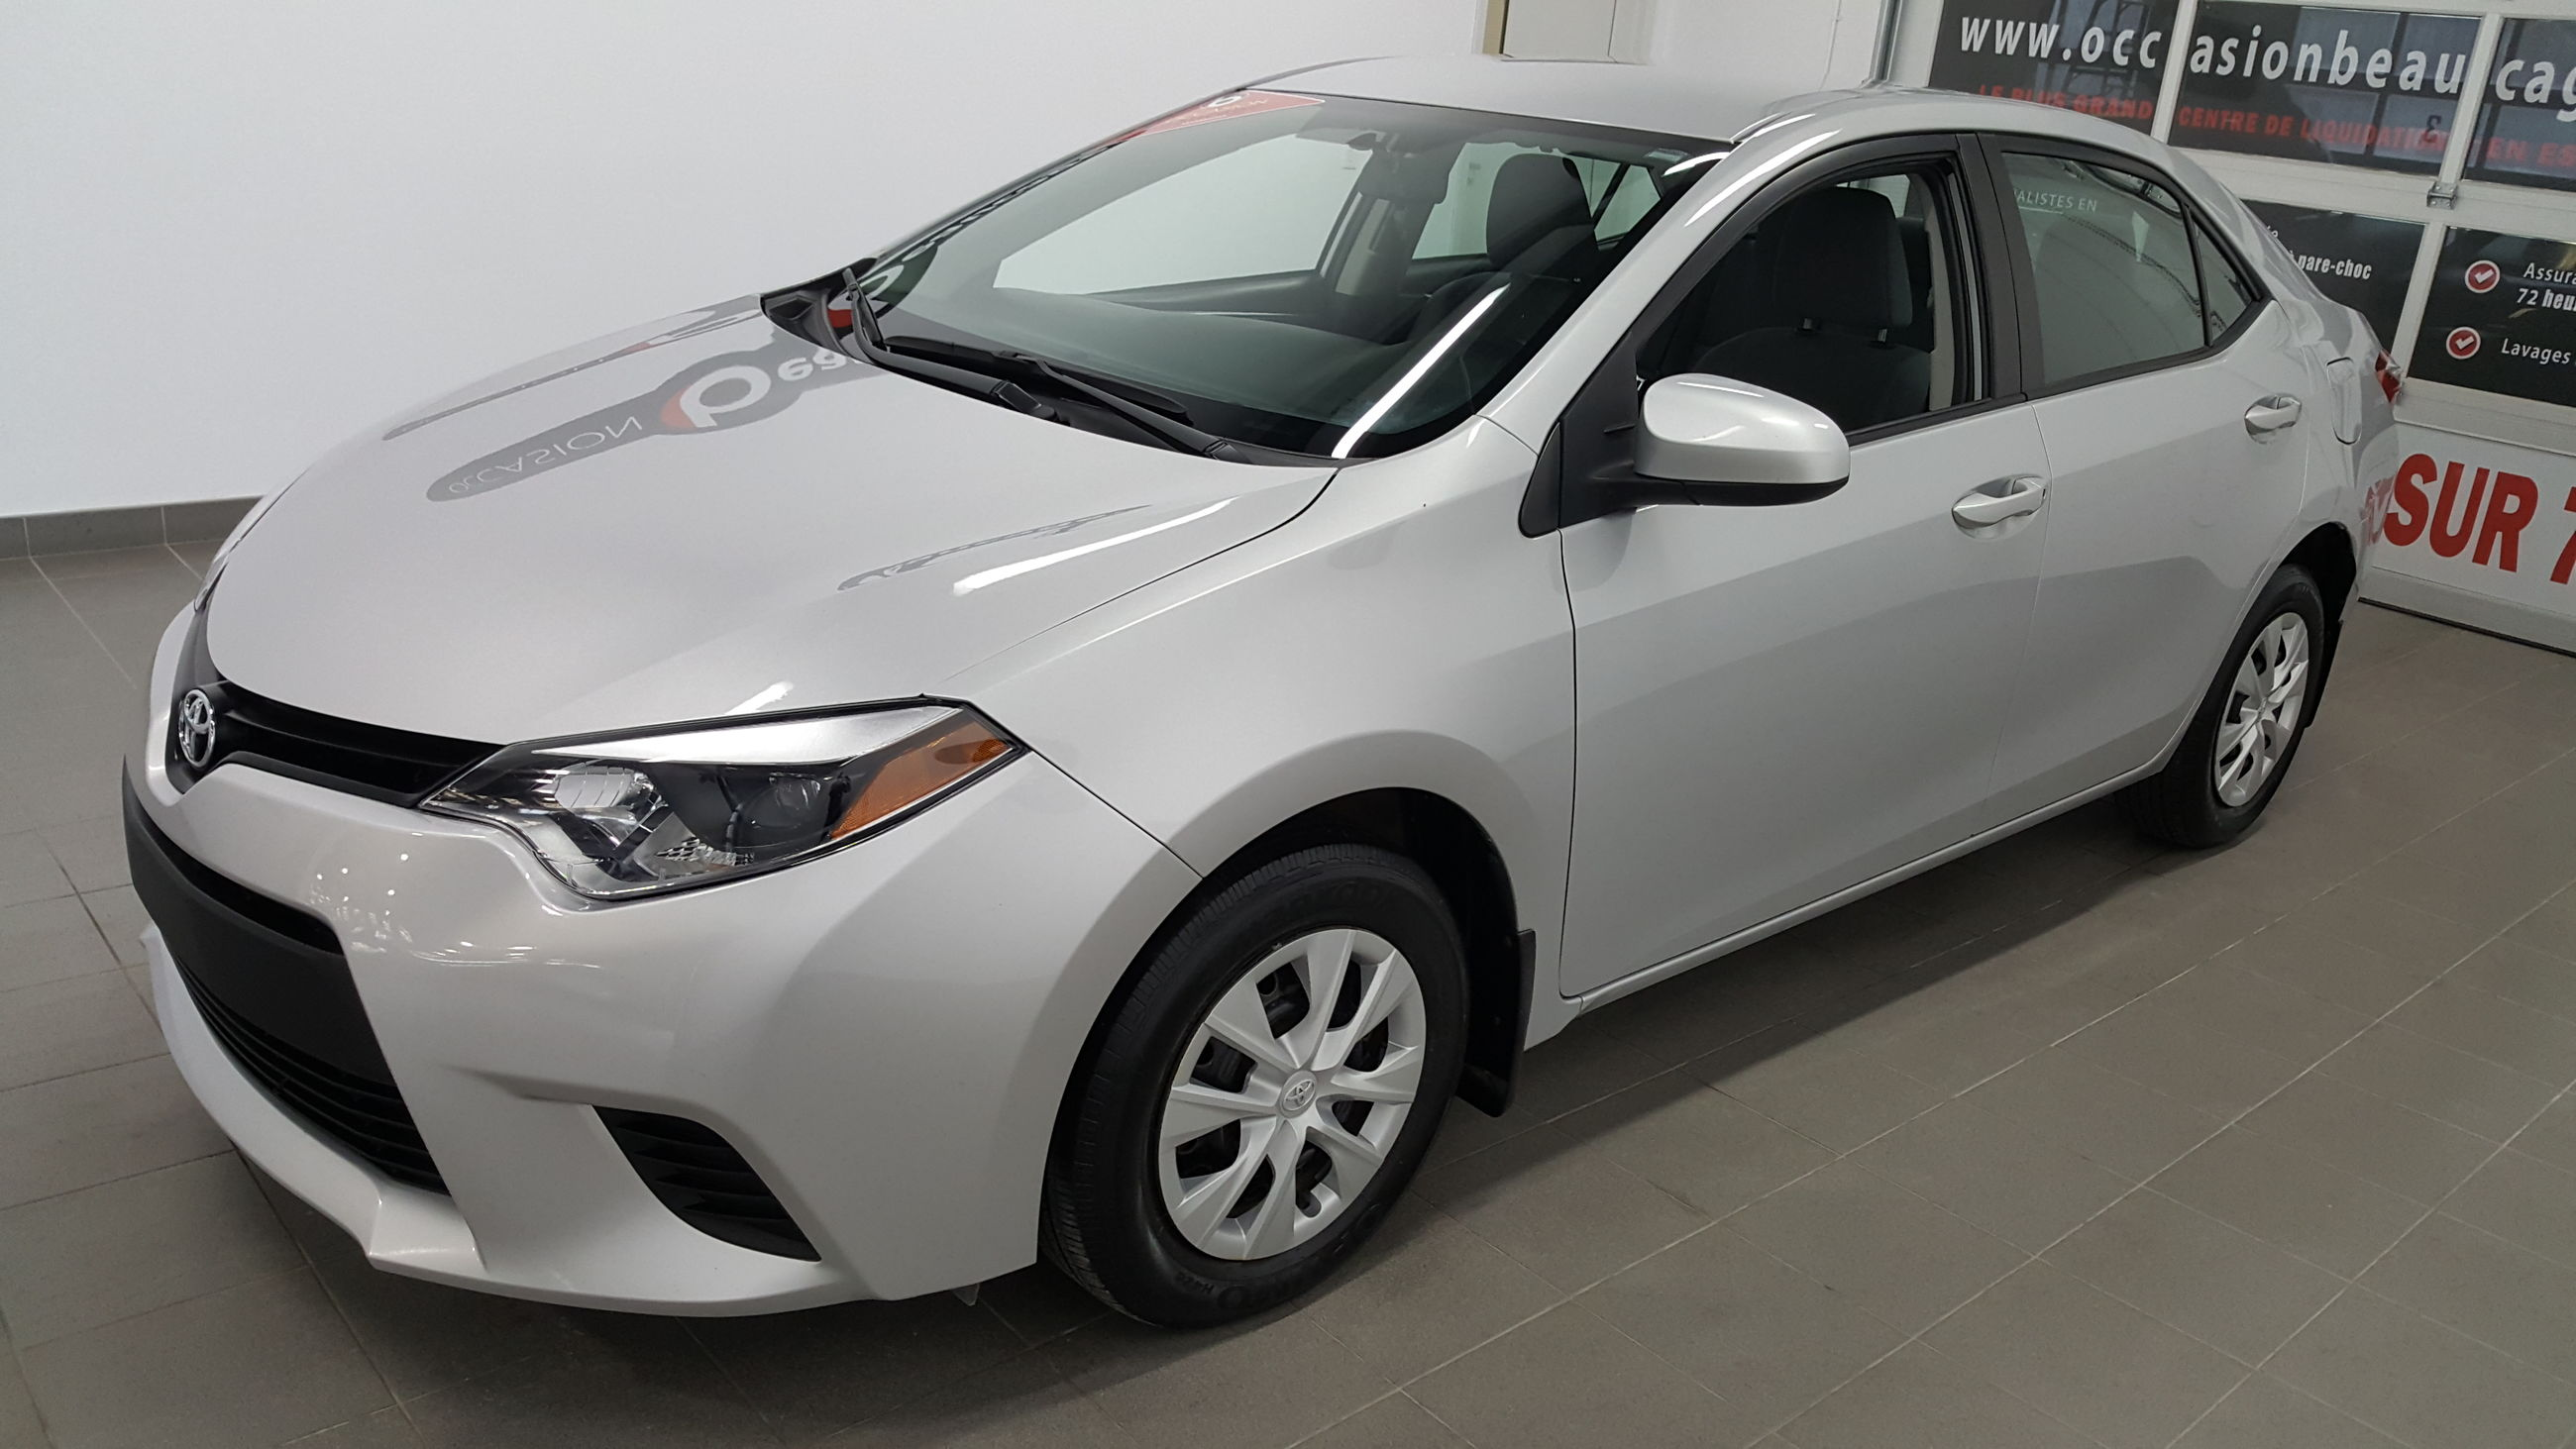 Groupe Beaucage Toyota Corolla 2014 Usag 233 224 Vendre En